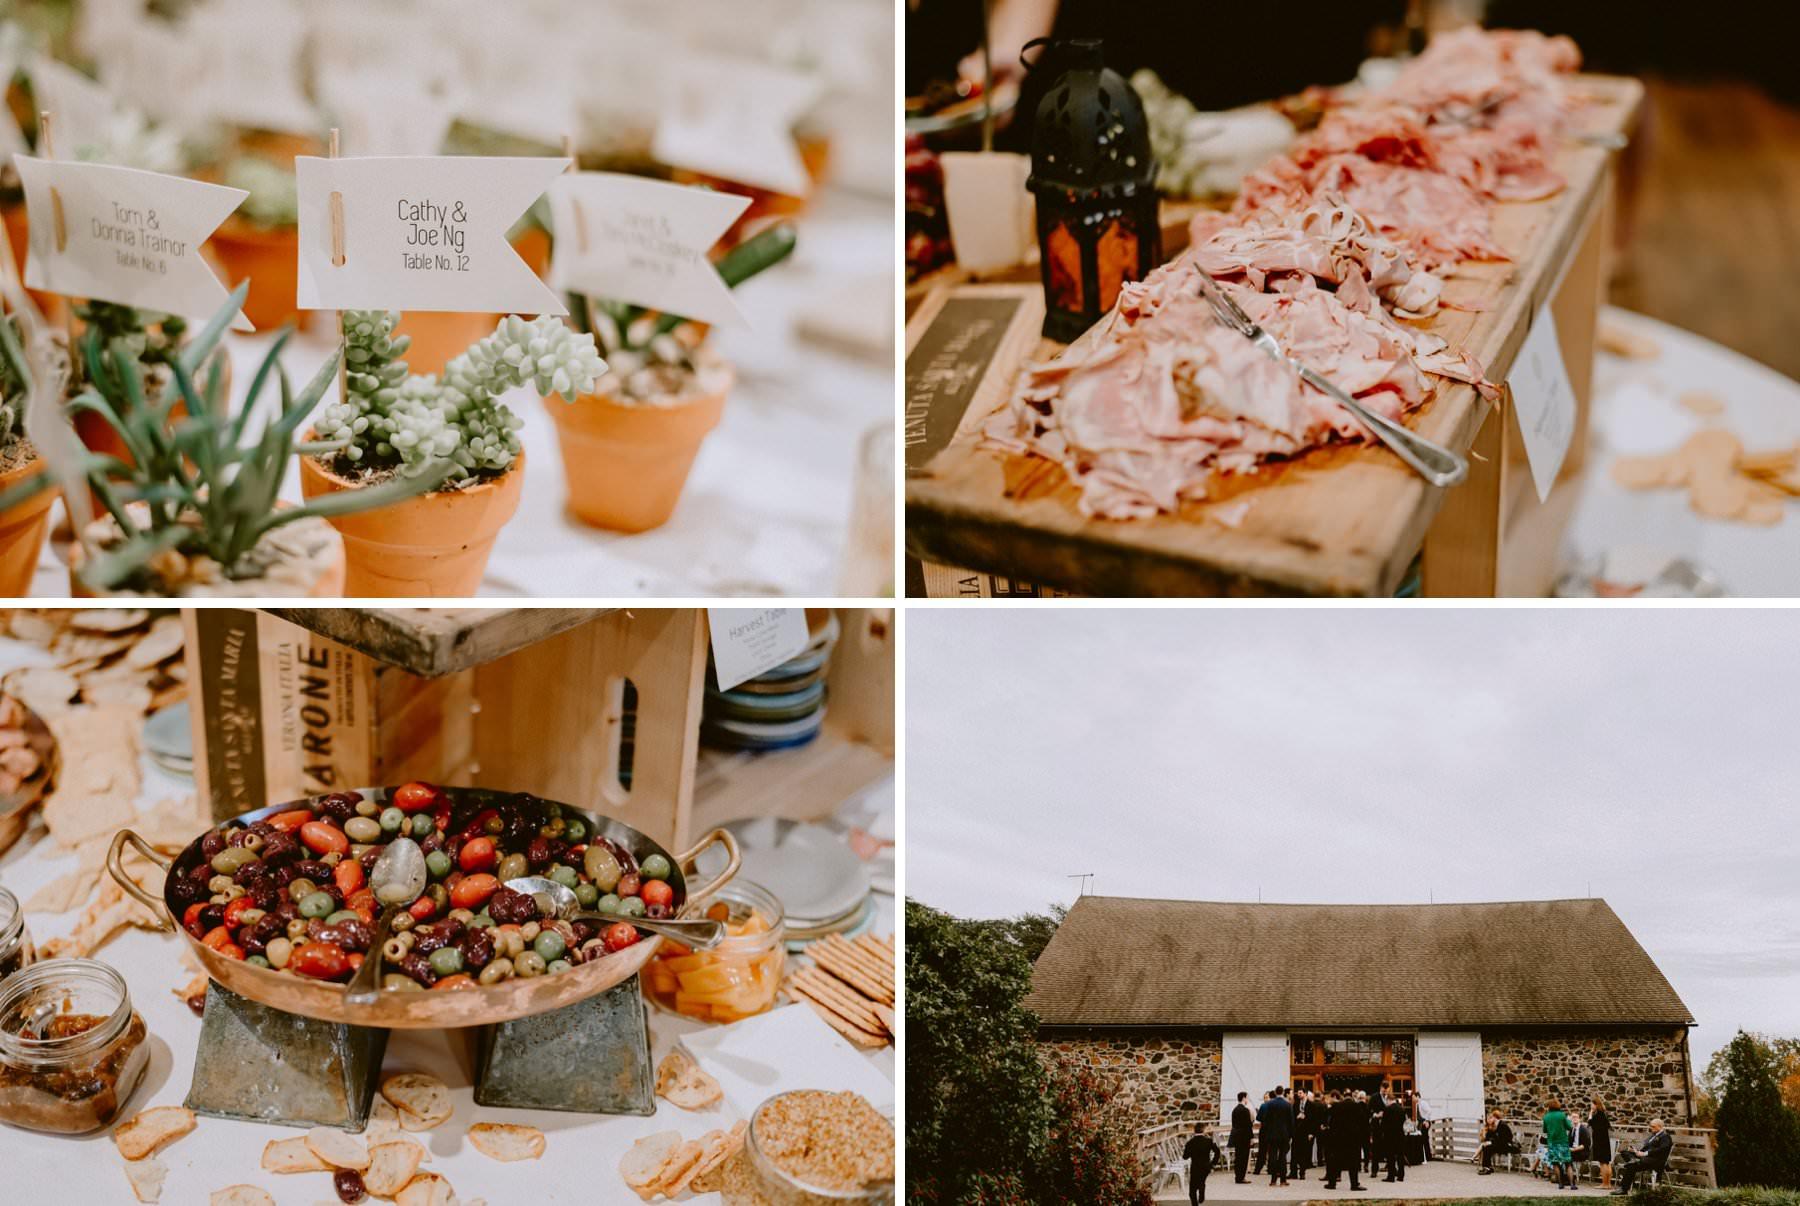 Tyler_arboretum_wedding-066.jpg